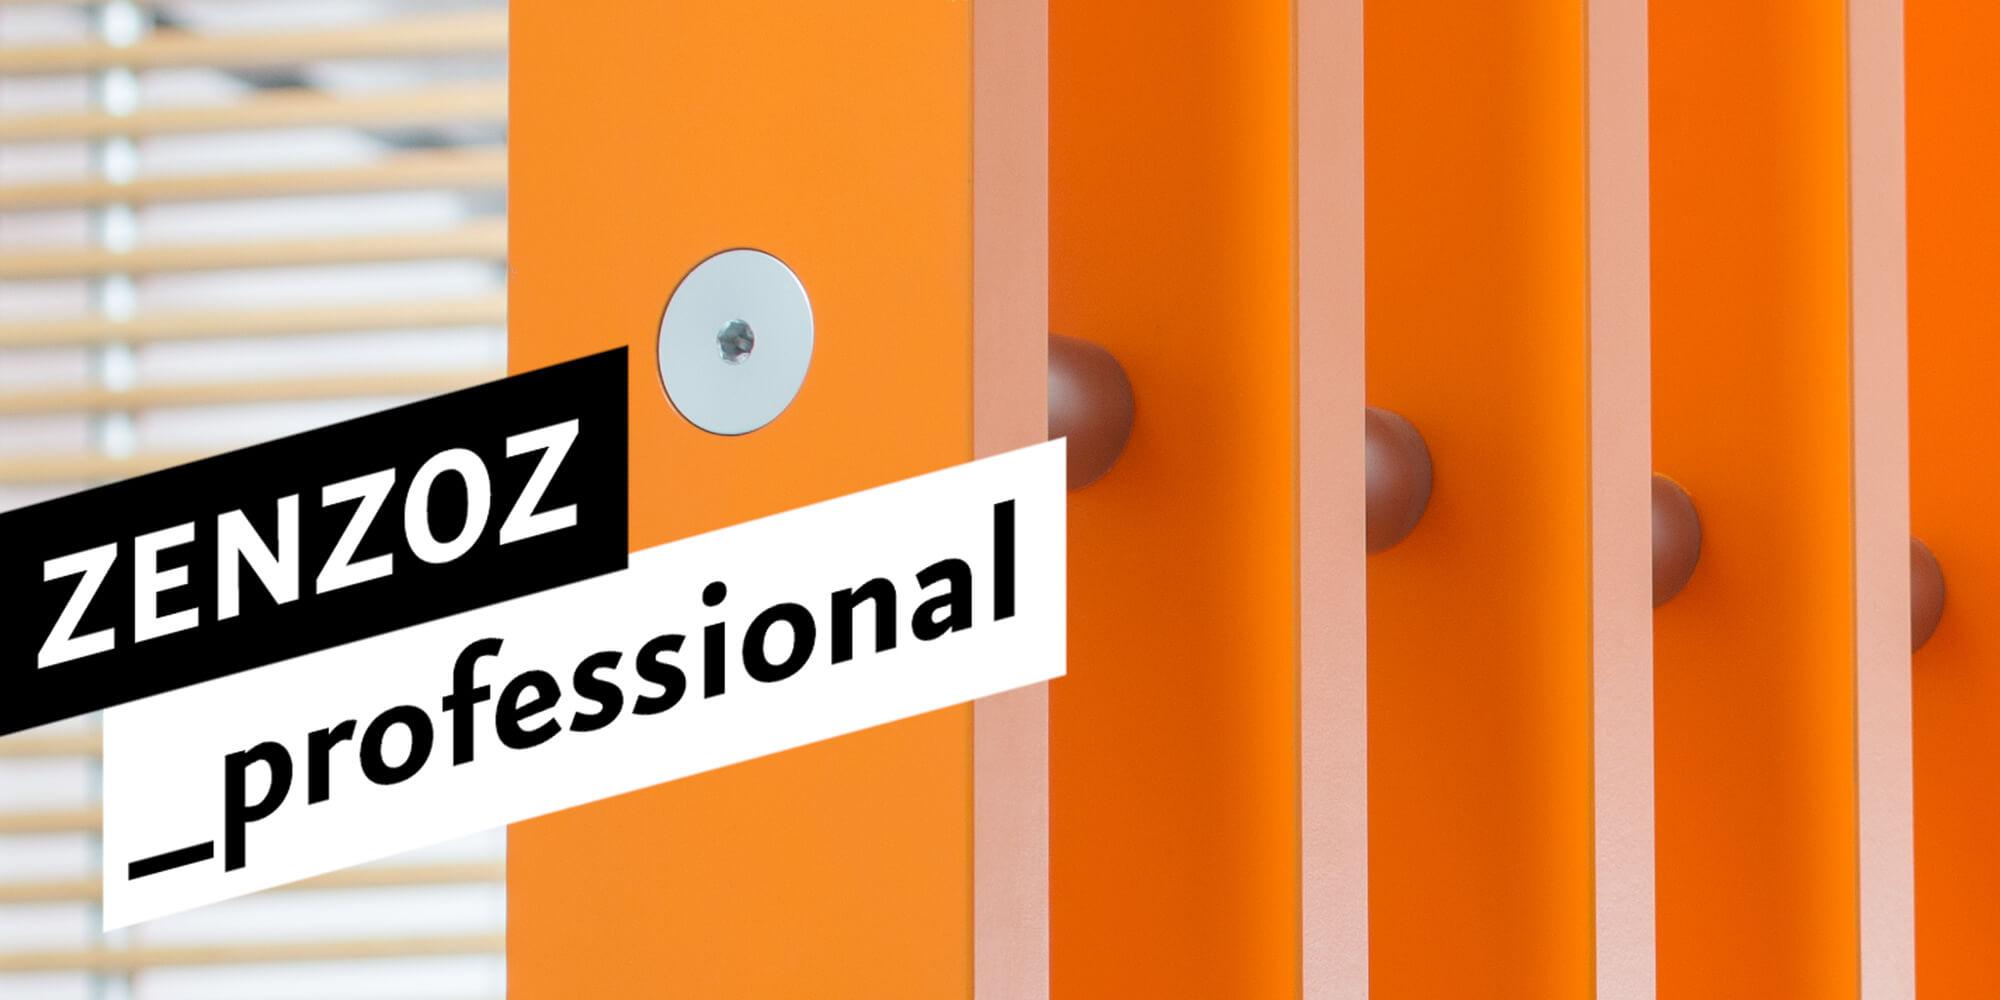 ZENZOZ_Themen_Teaser_professional_1